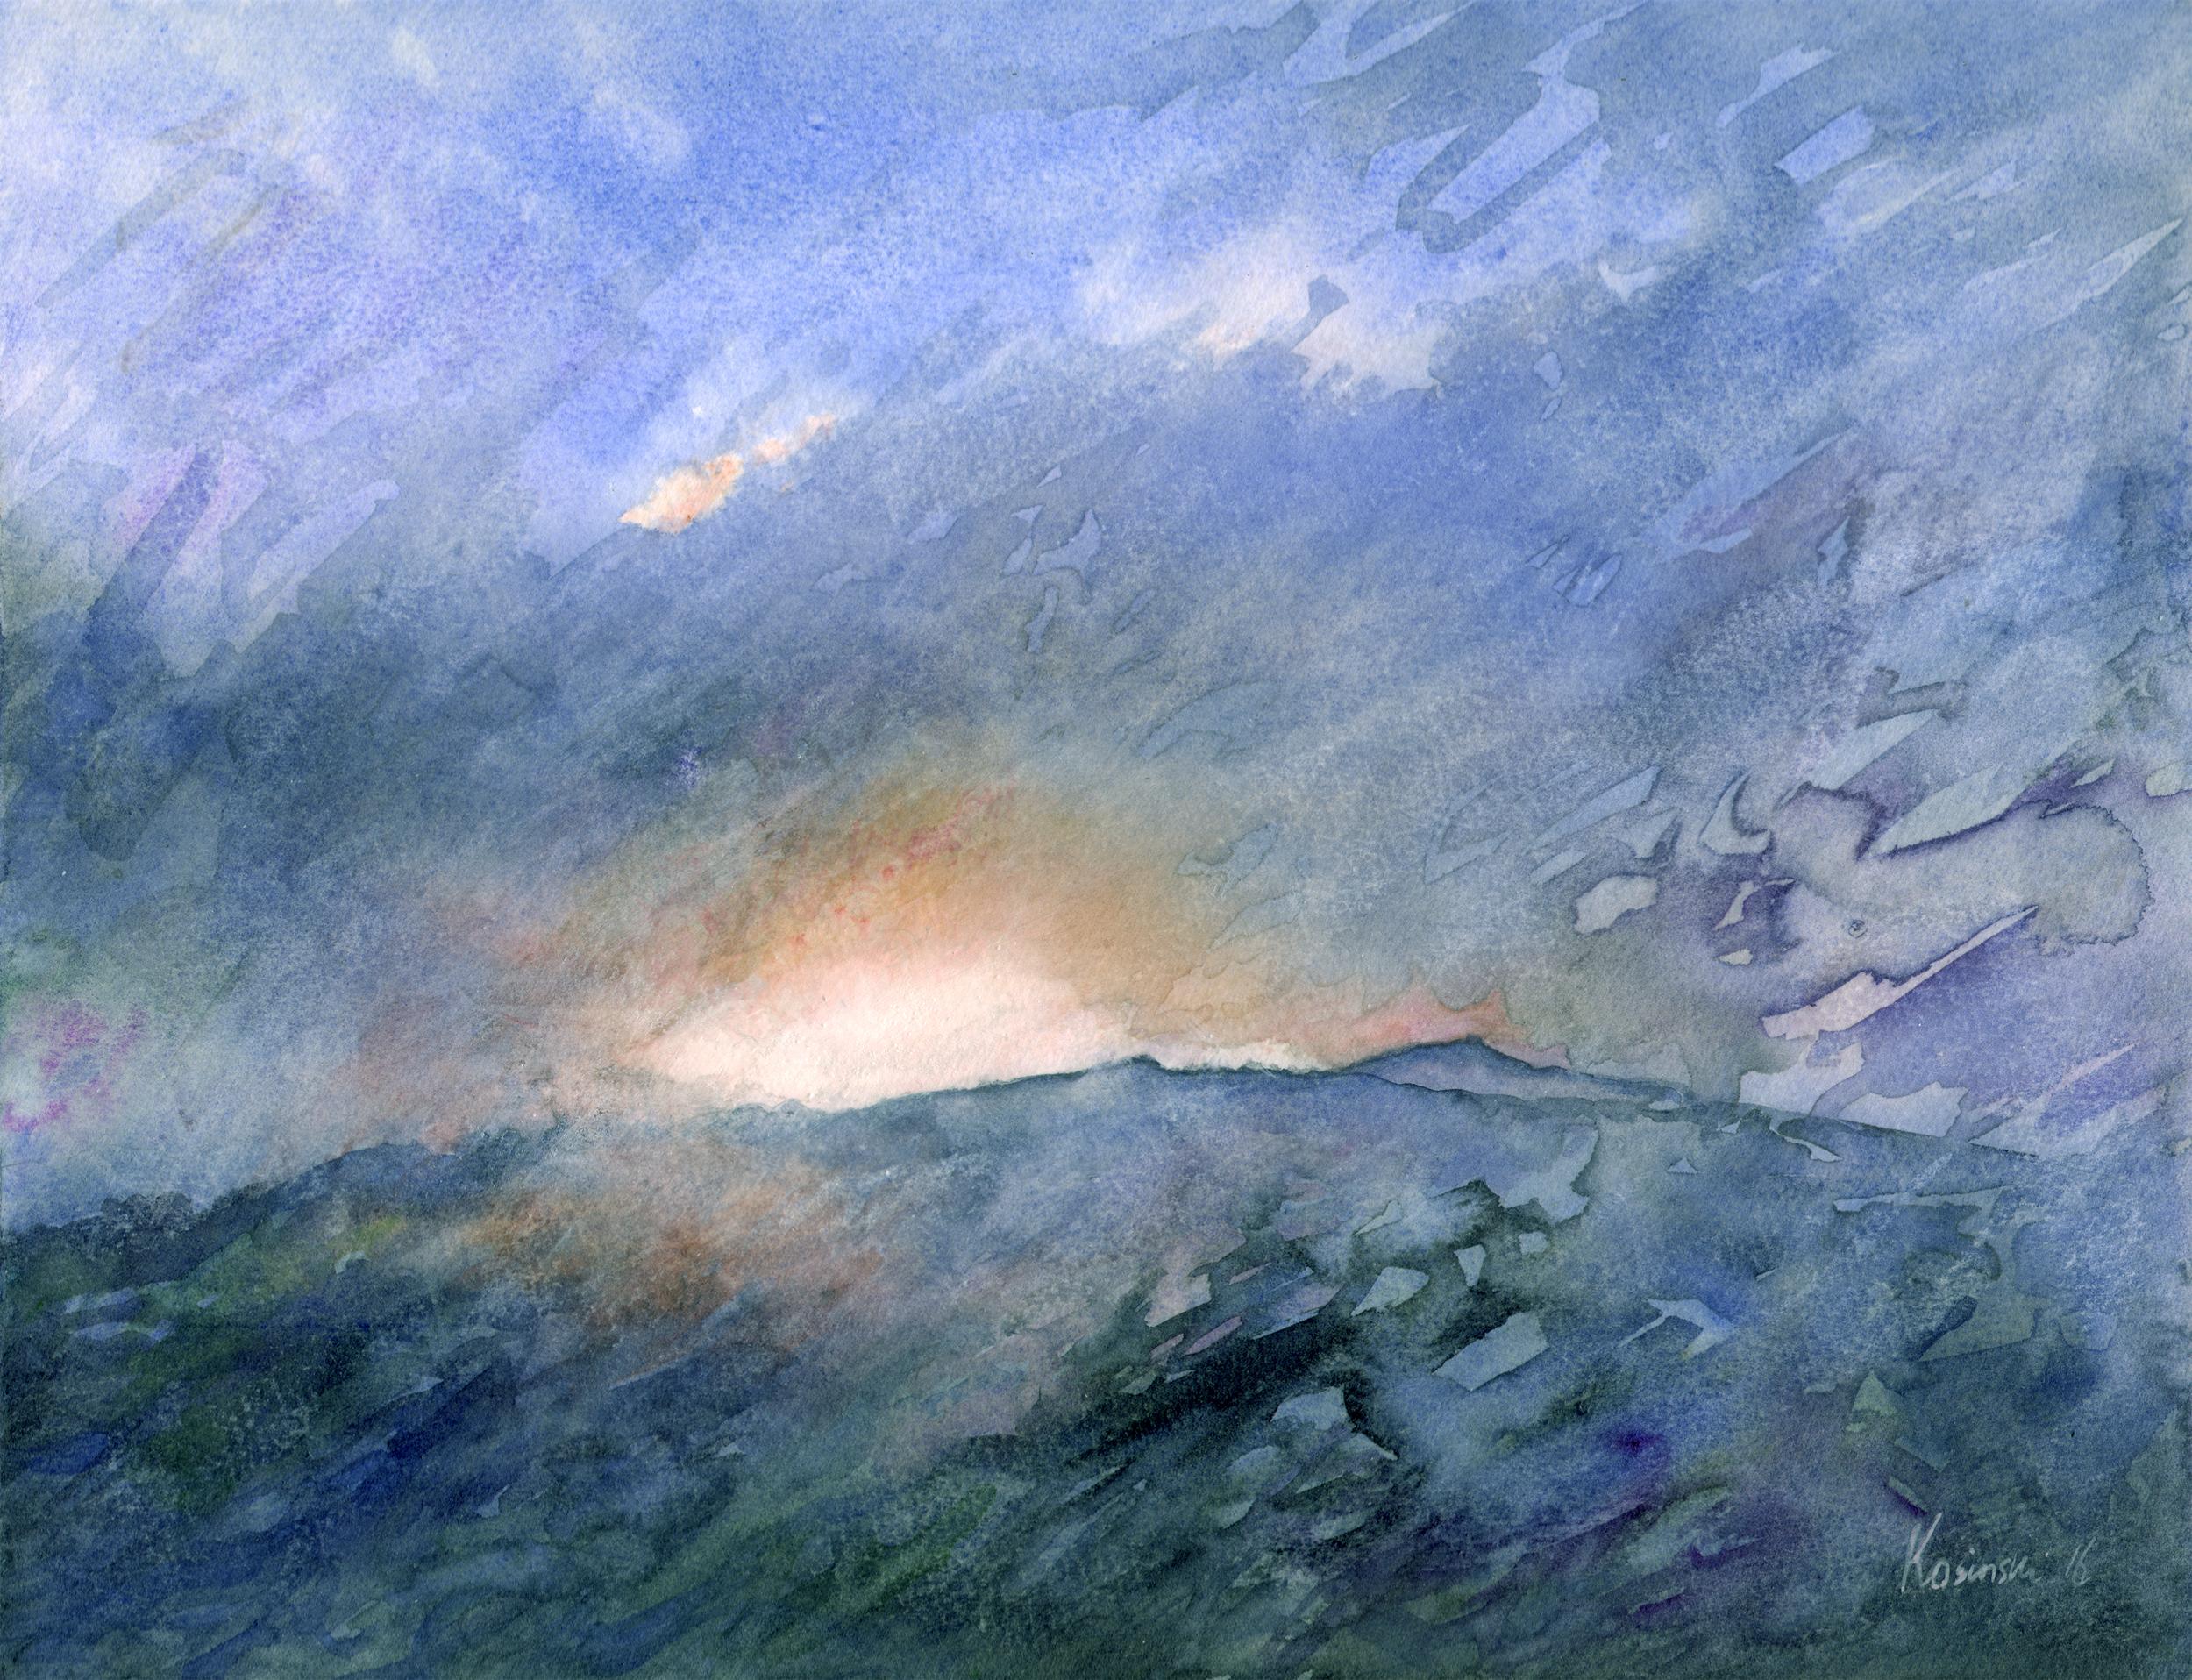 Sunset, Wilburn Ridge, Grayson Highlands